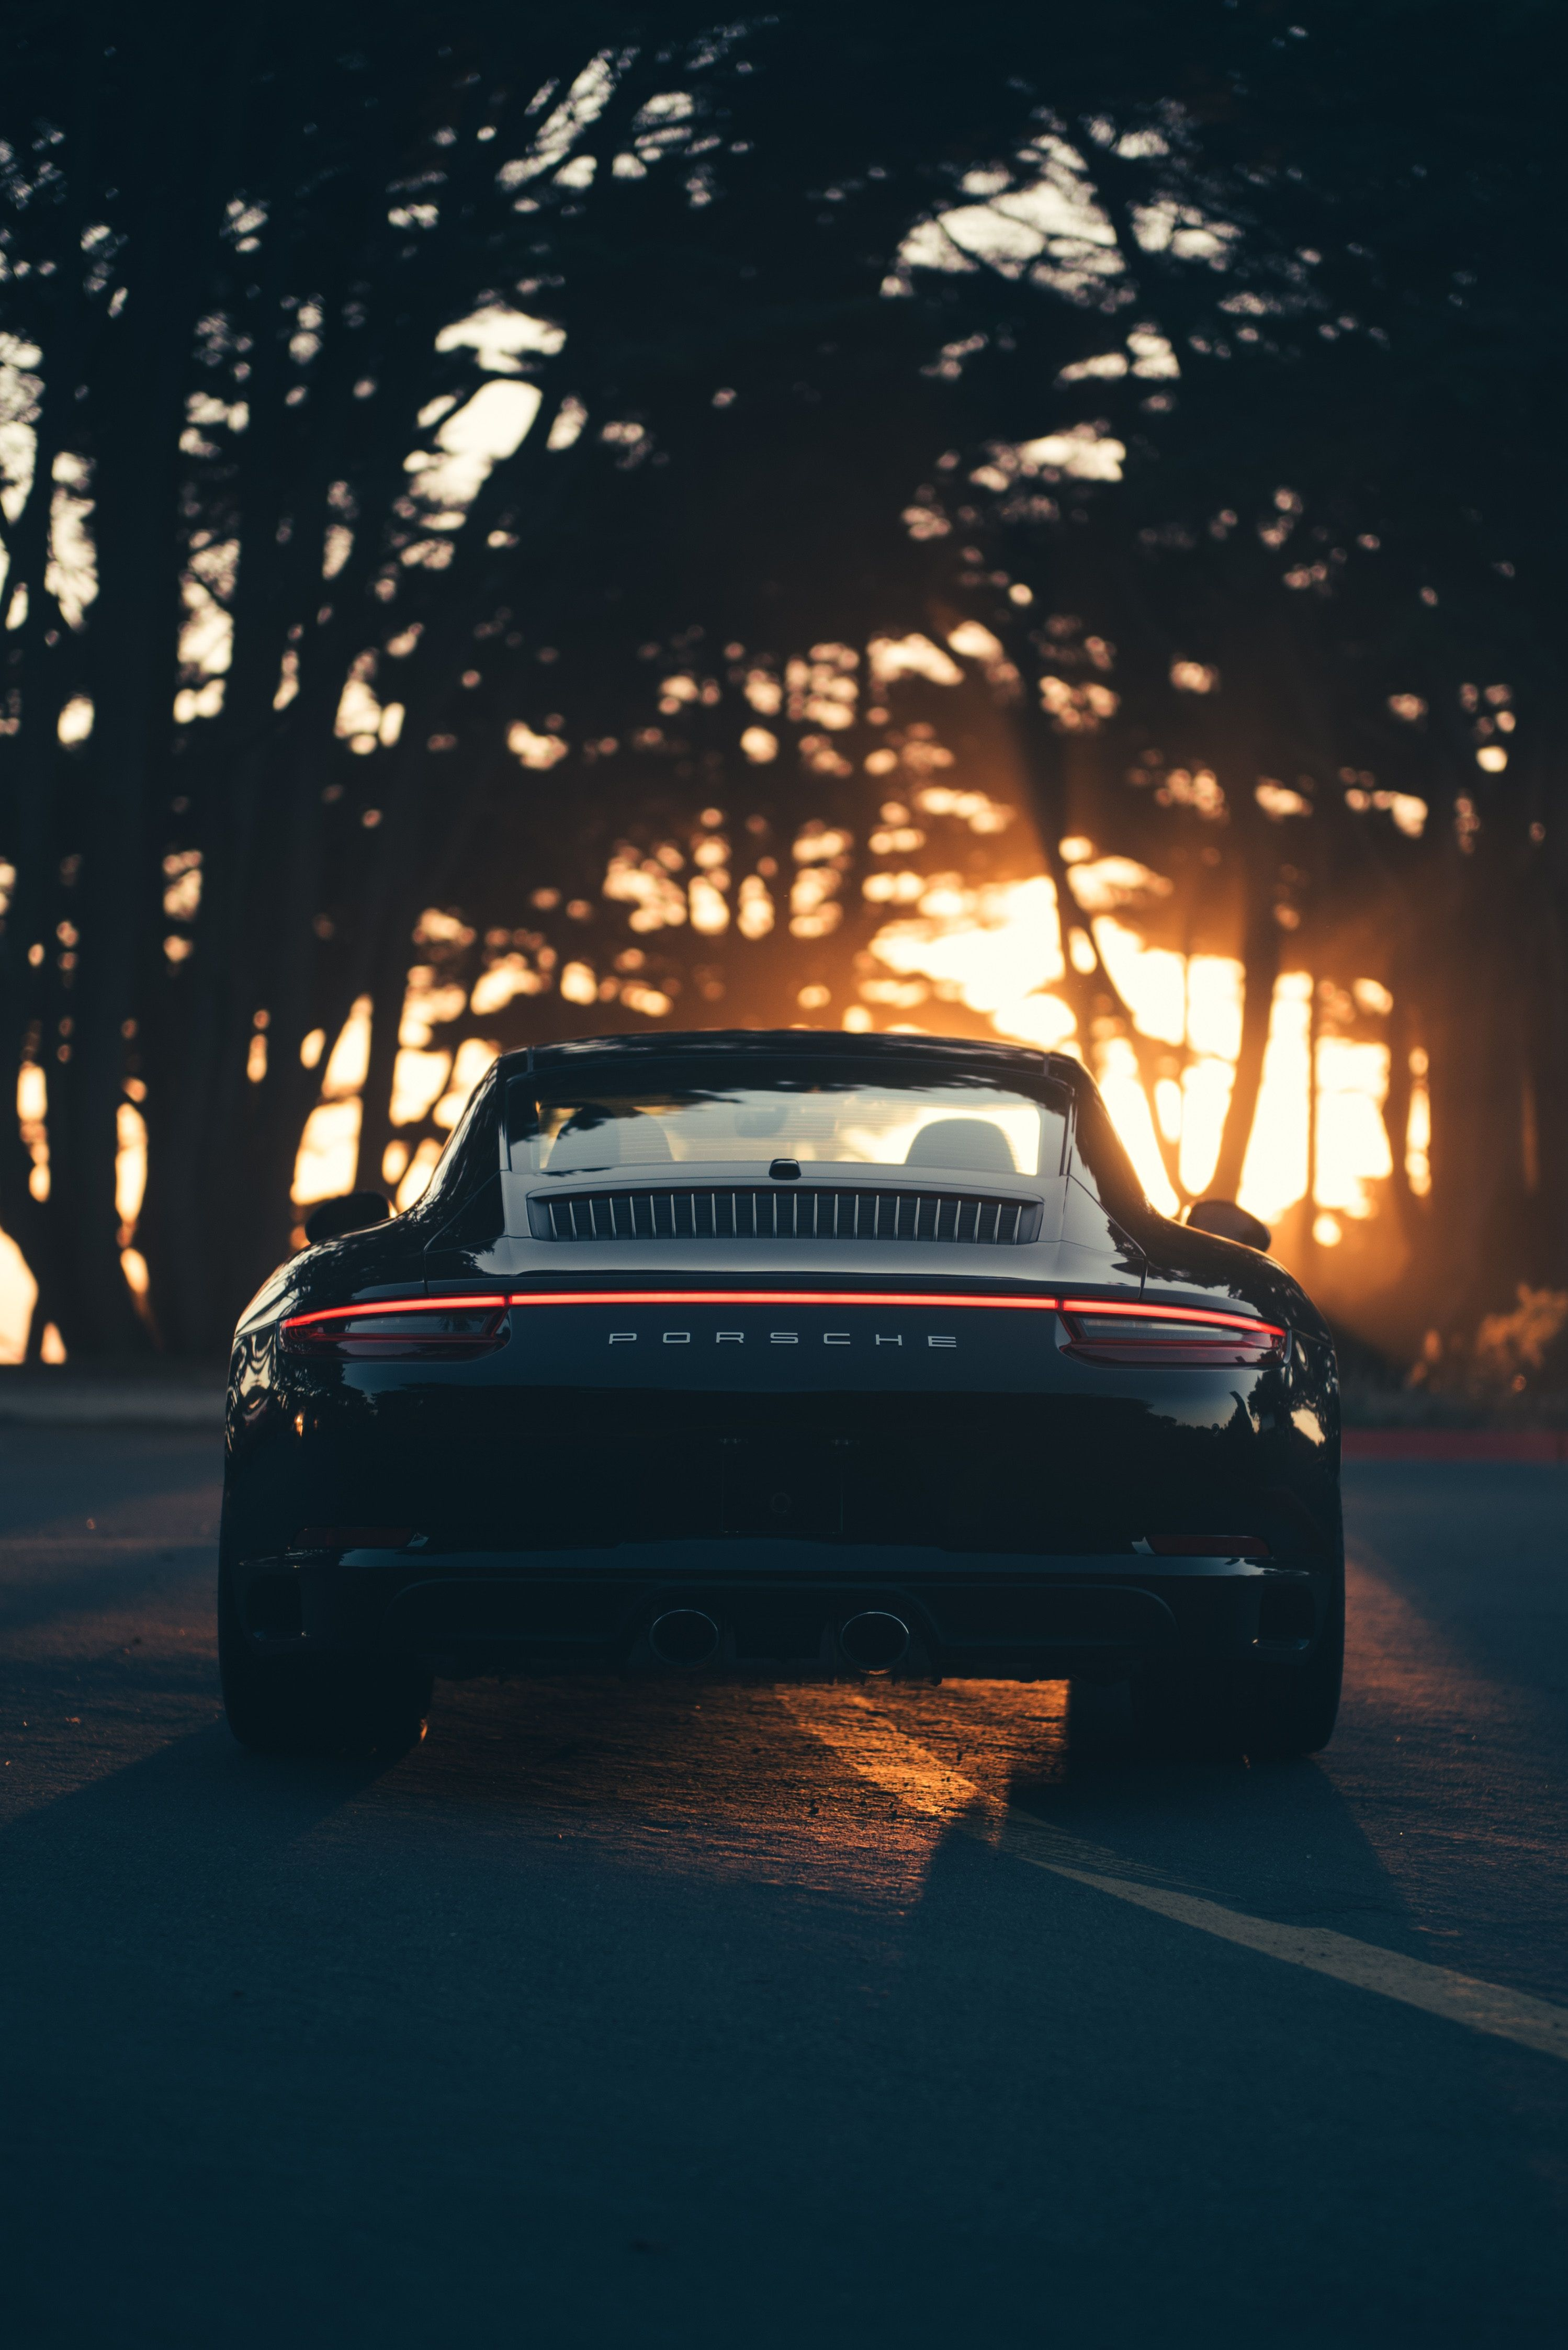 More On Our Instagram Page One Pct Porsche Porschecars Supercar Sportscar Sportcar Carphoto Carphotography P Car Wallpapers Super Cars Car Photography